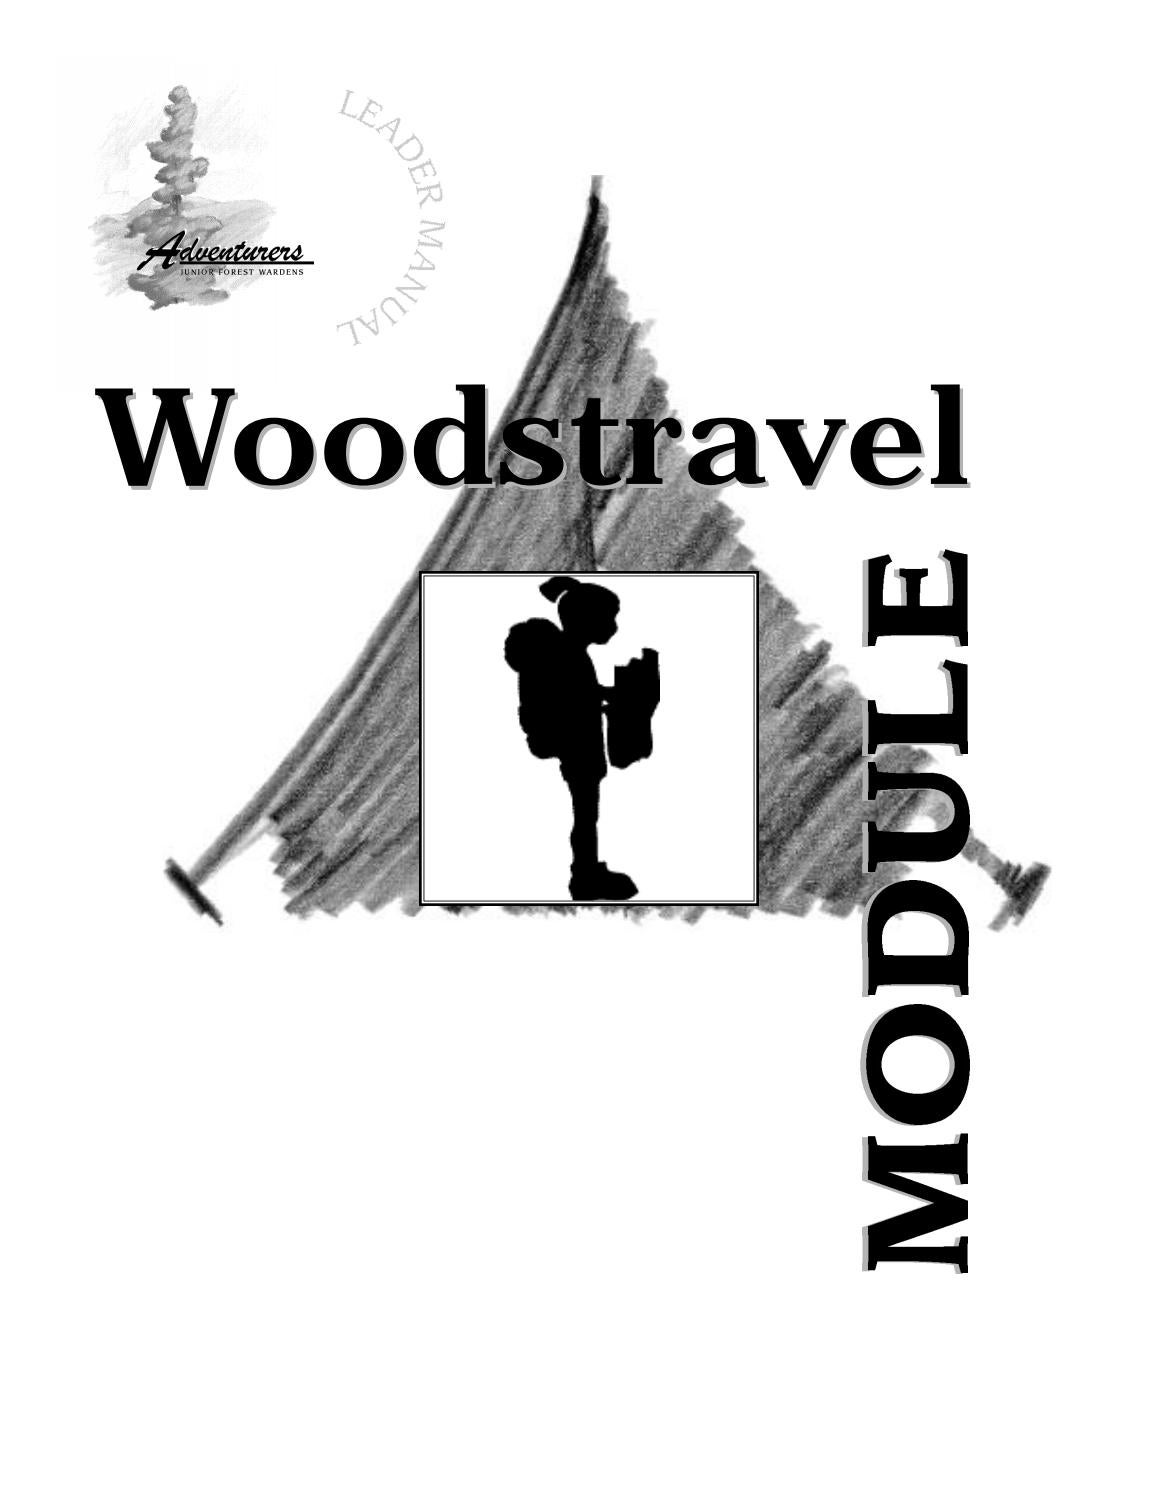 05e51aad523 Adventurer woodstravel module by Killer - issuu